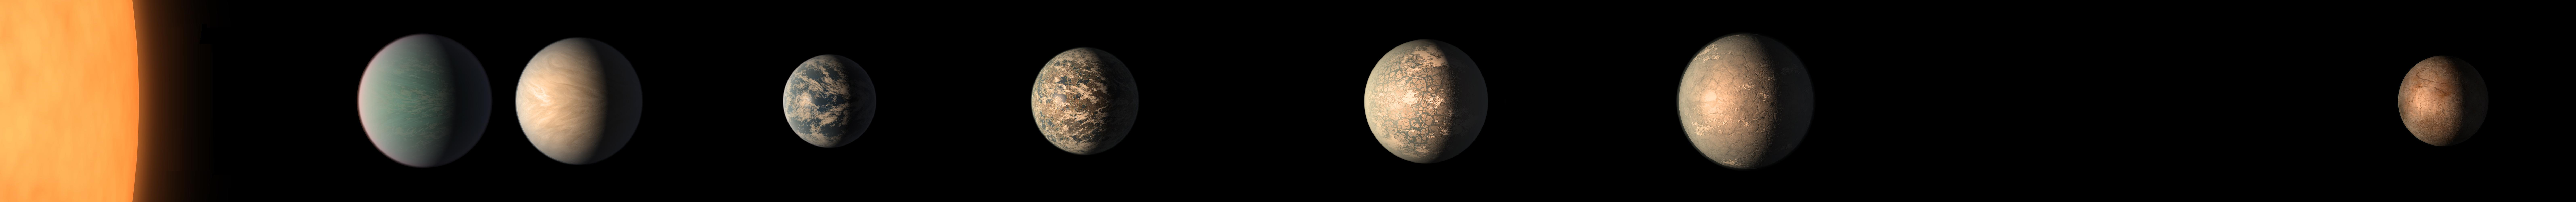 TRAPPIST-1 navbox.jpg